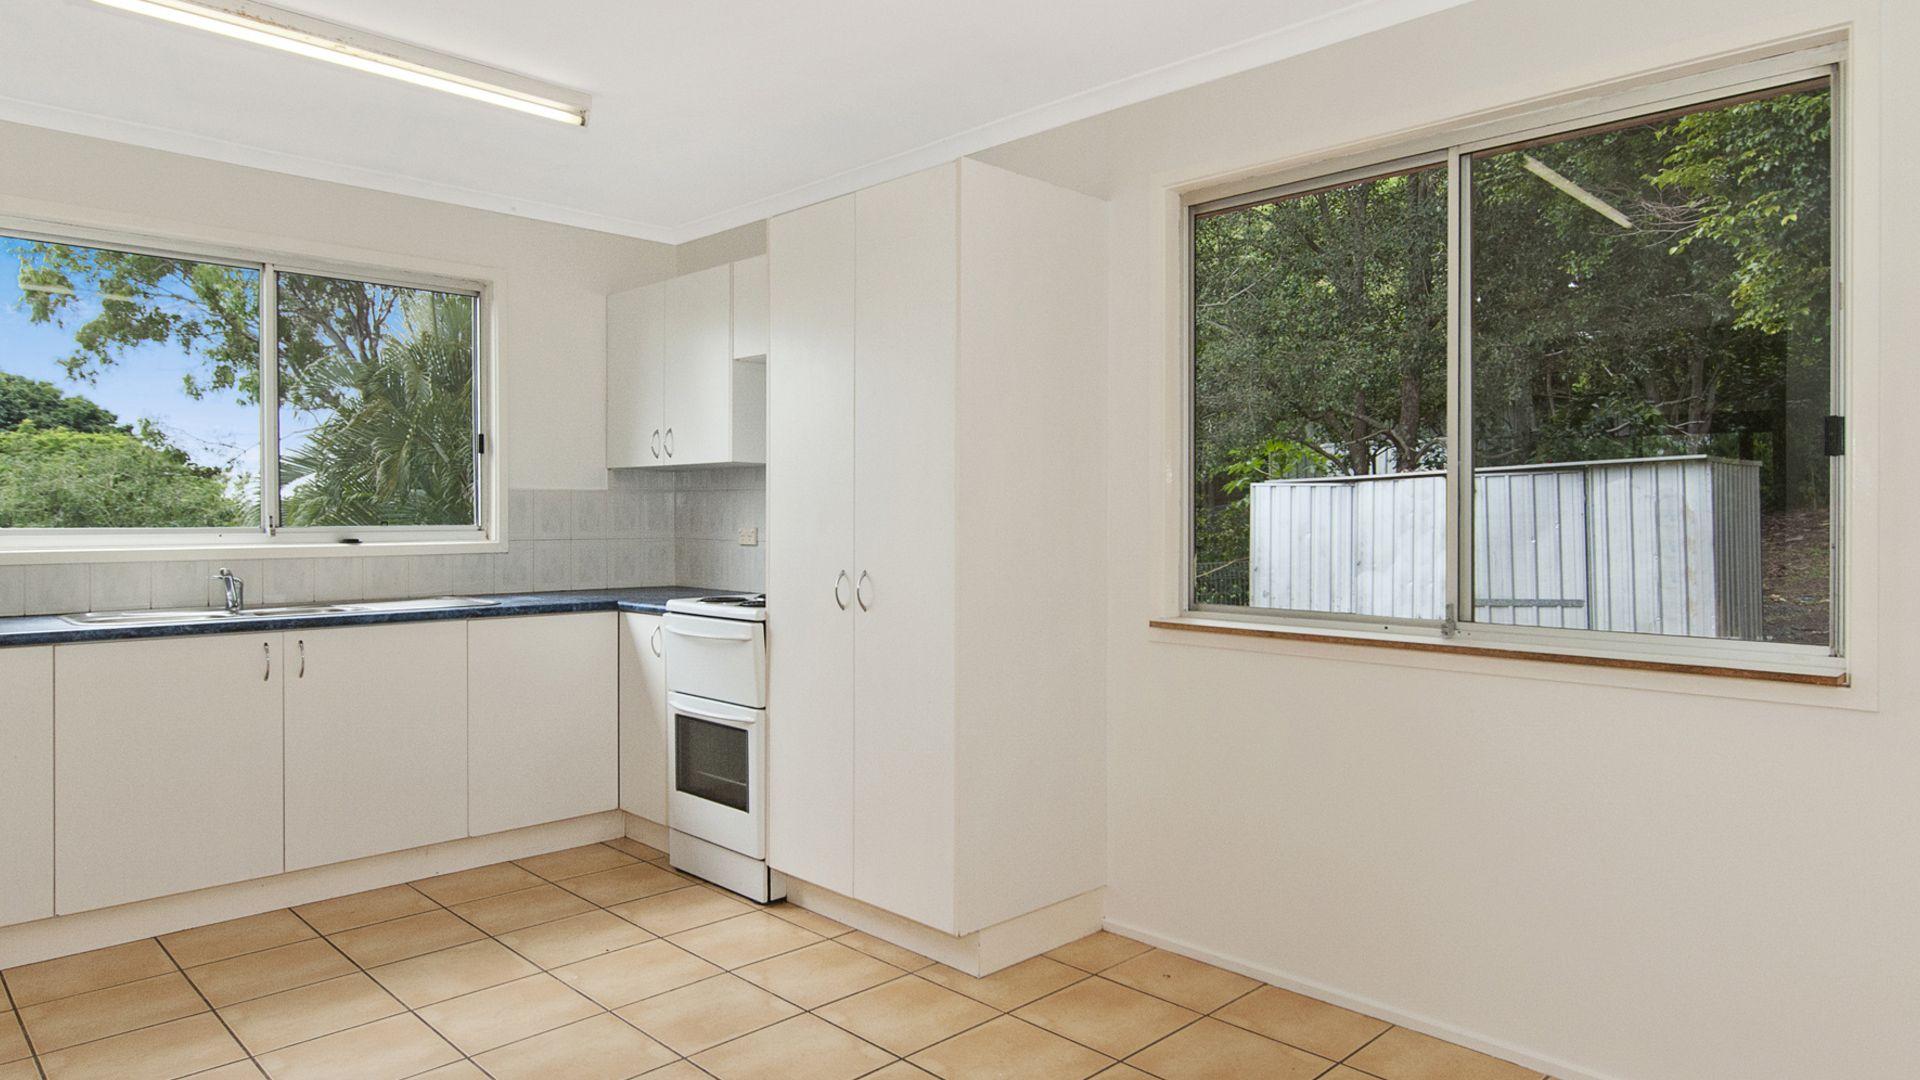 22 Lima Street, Holmview QLD 4207, Image 2